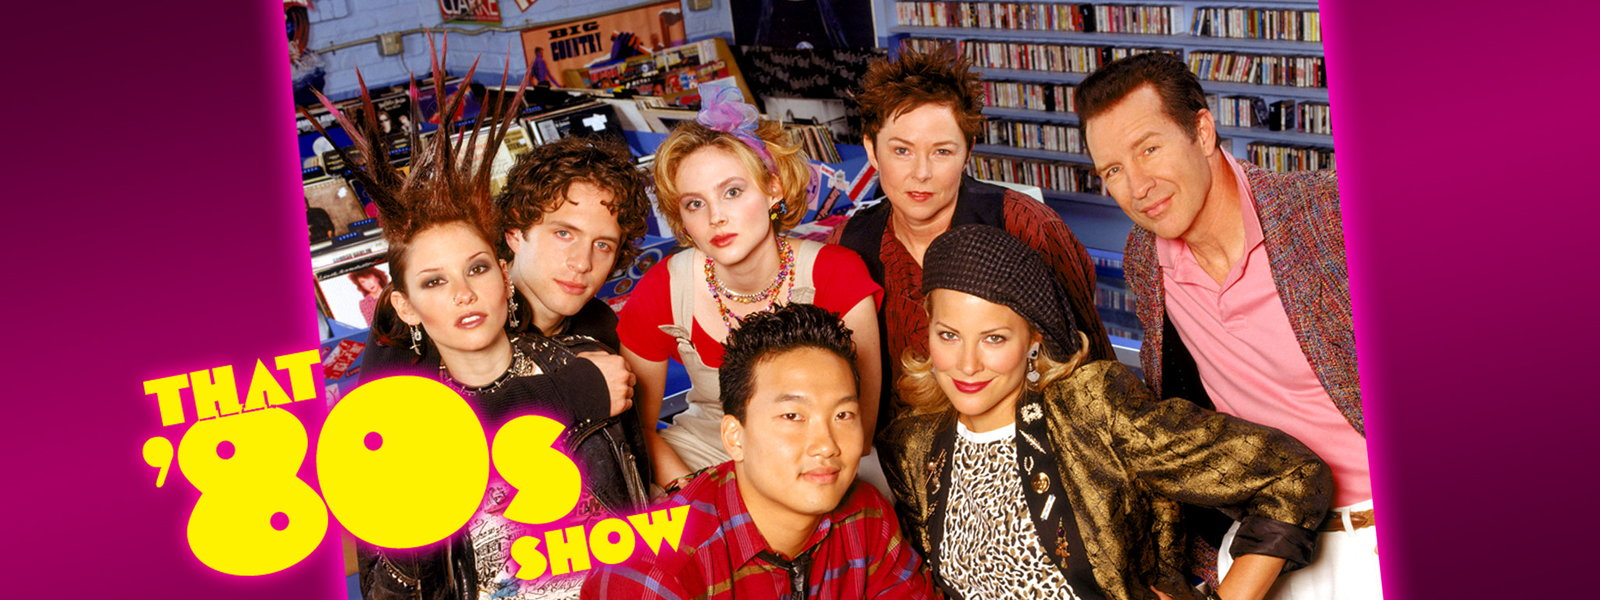 That 80s Show Cast Dead friend), the fellas talk about rt's pervy ...